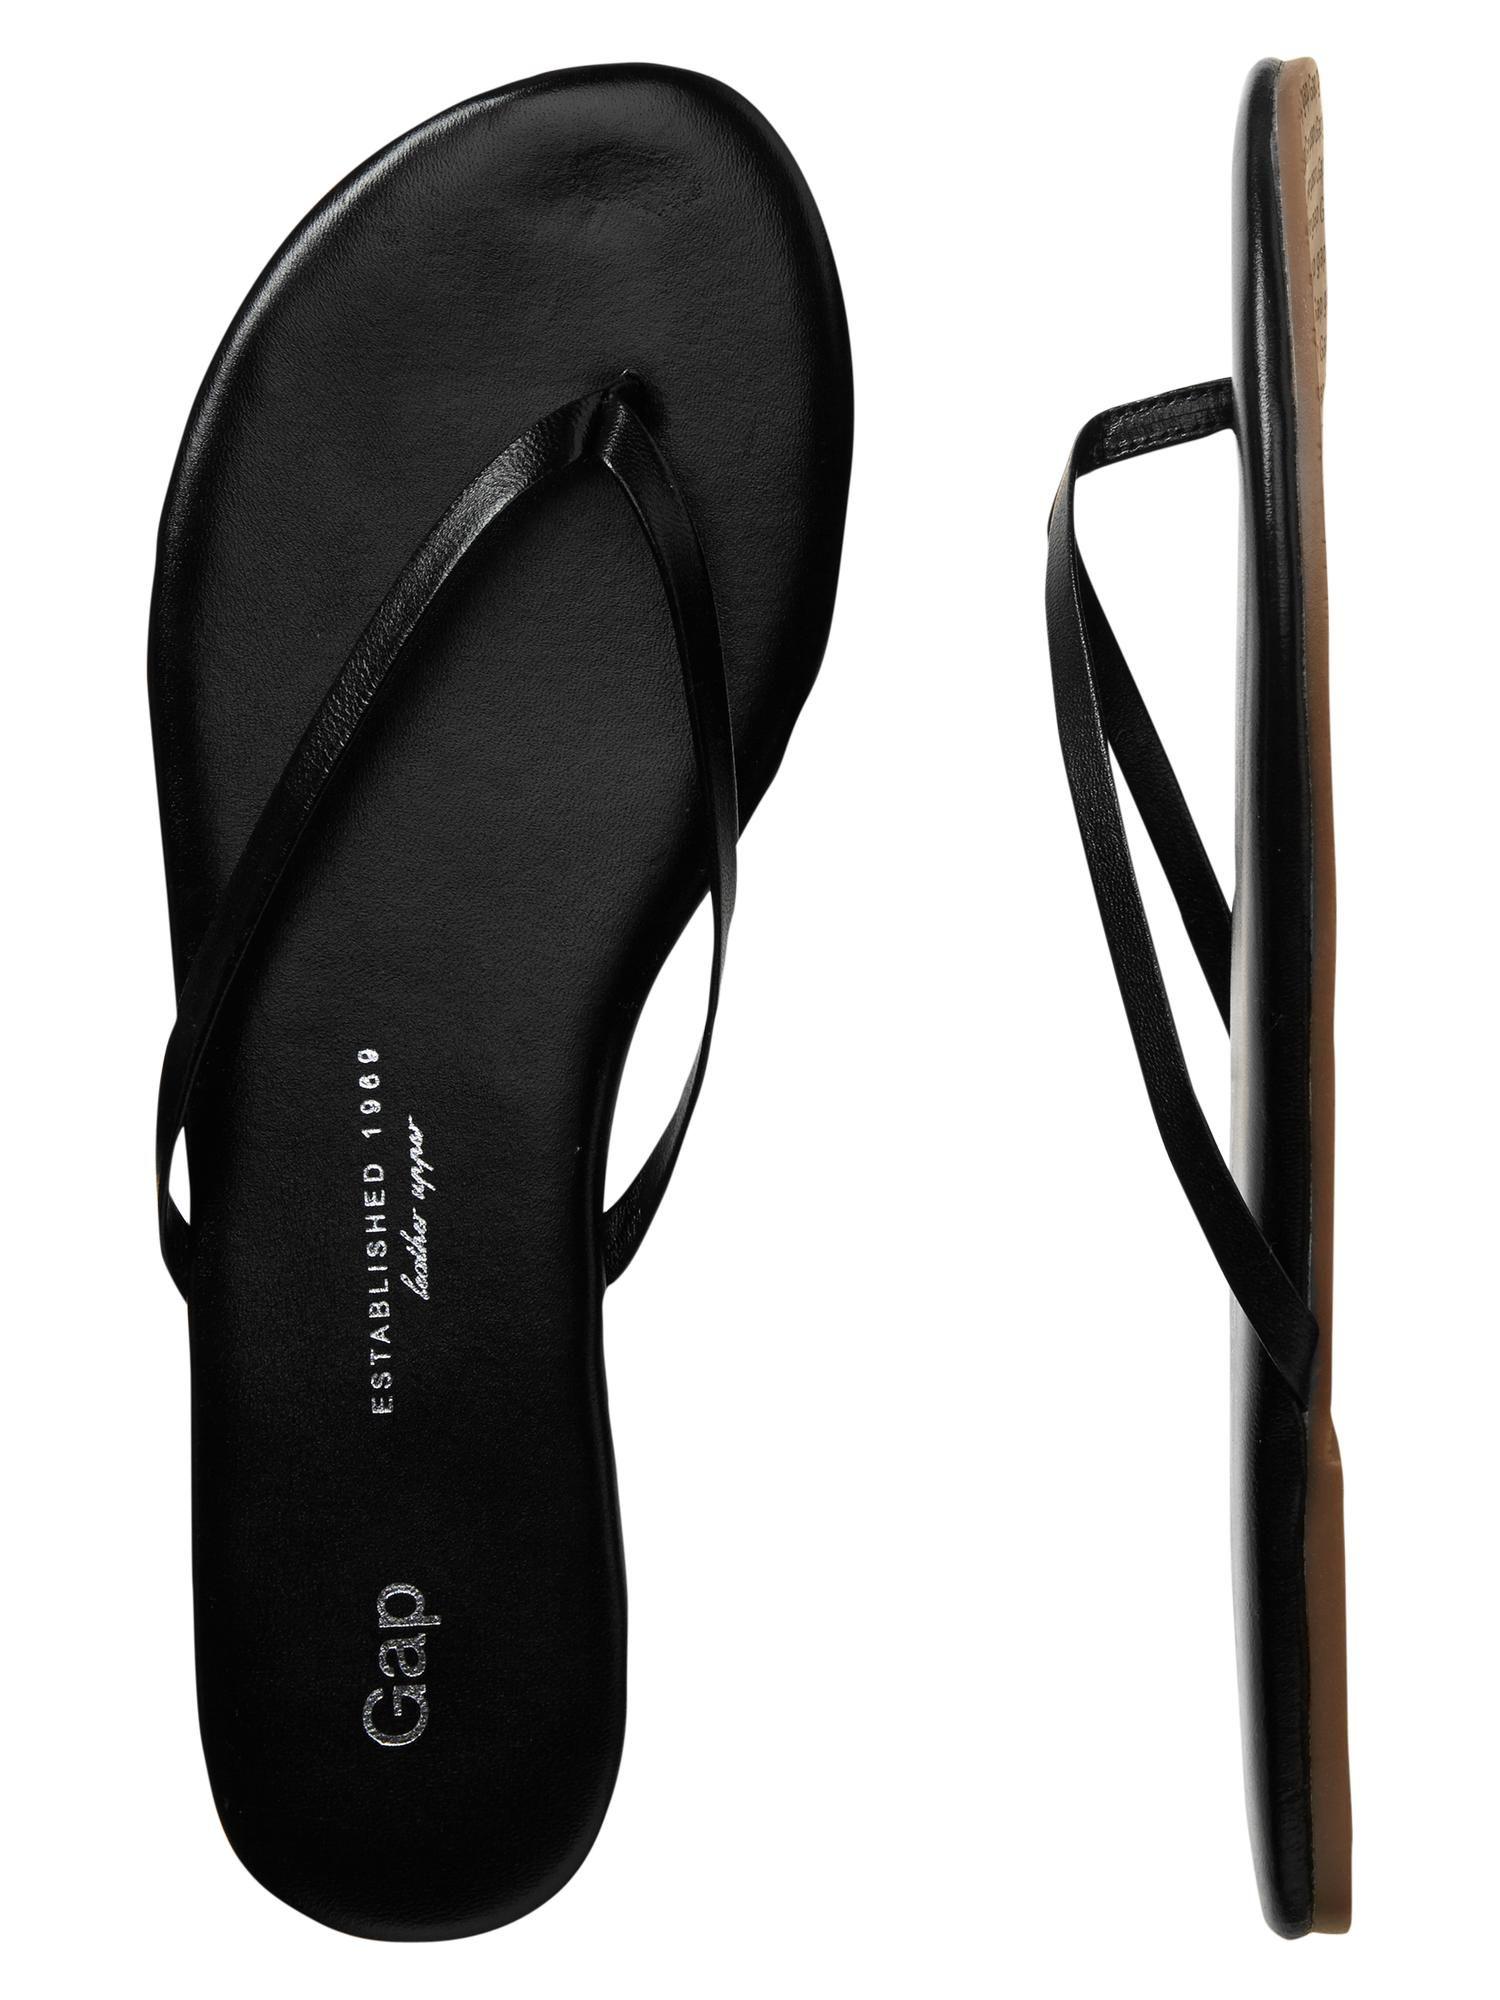 Gap leather flip flops | Leather flip